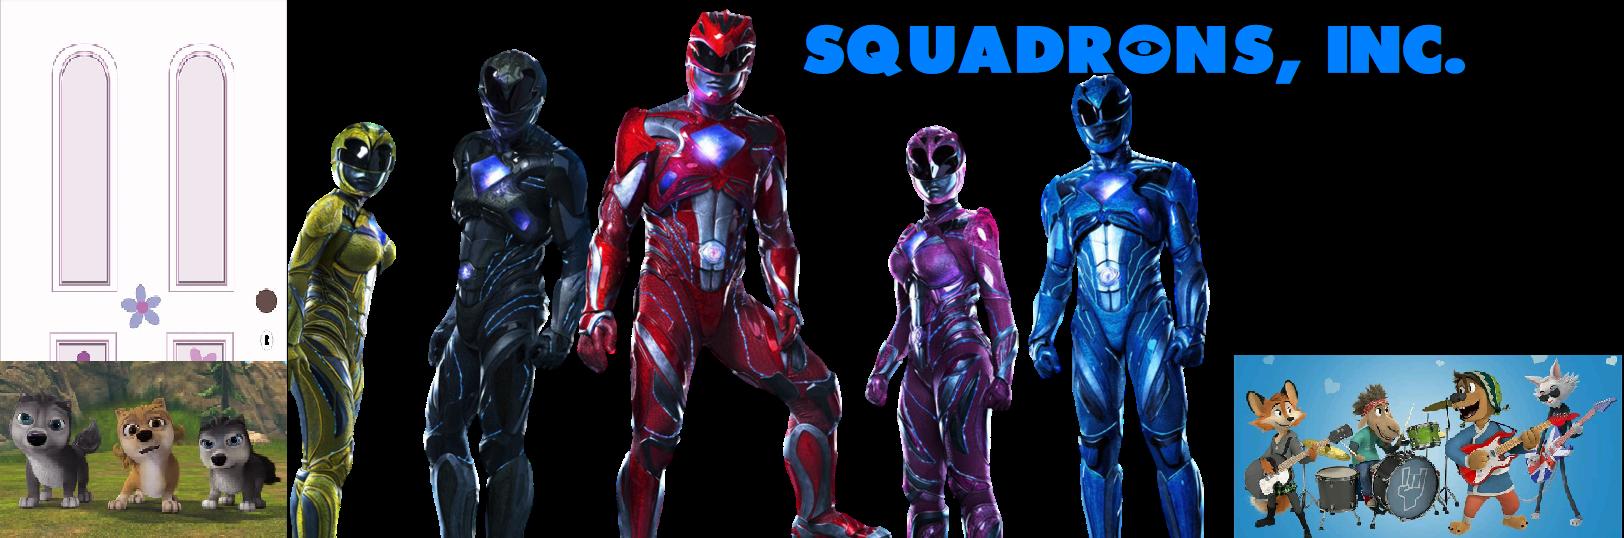 Squadrons, Inc.